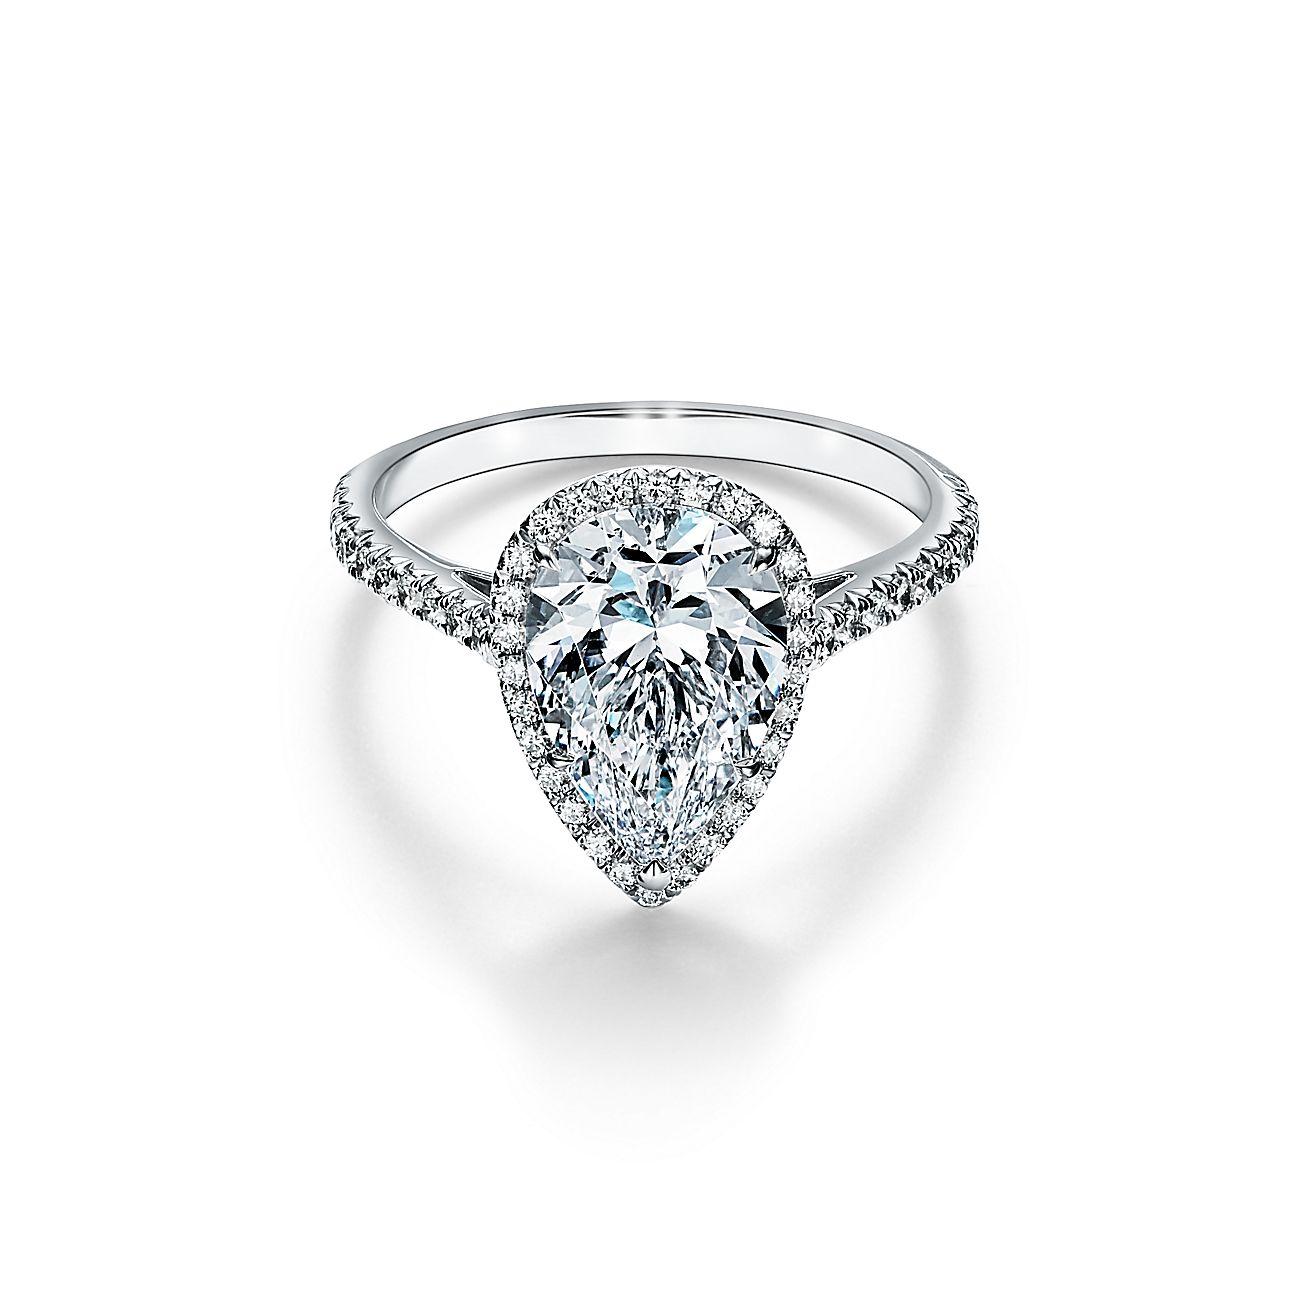 18ct White Gold Diamond Cluster Ring Nicholas Wylde